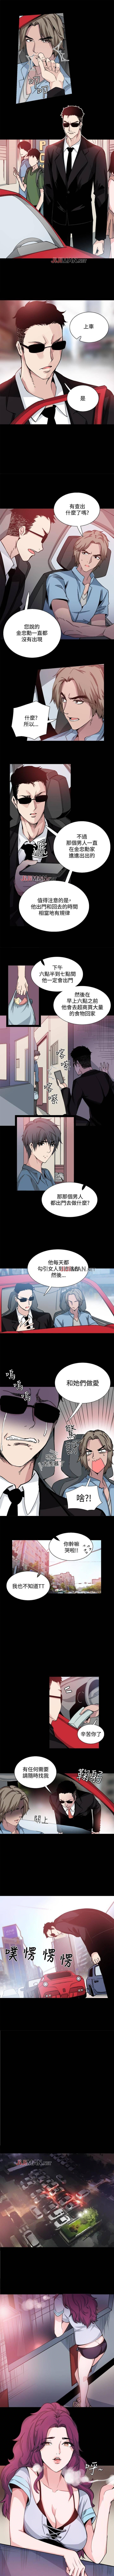 【已完结】Bodychange(作者:Seize & 死亡節奏) 第1~33话 78